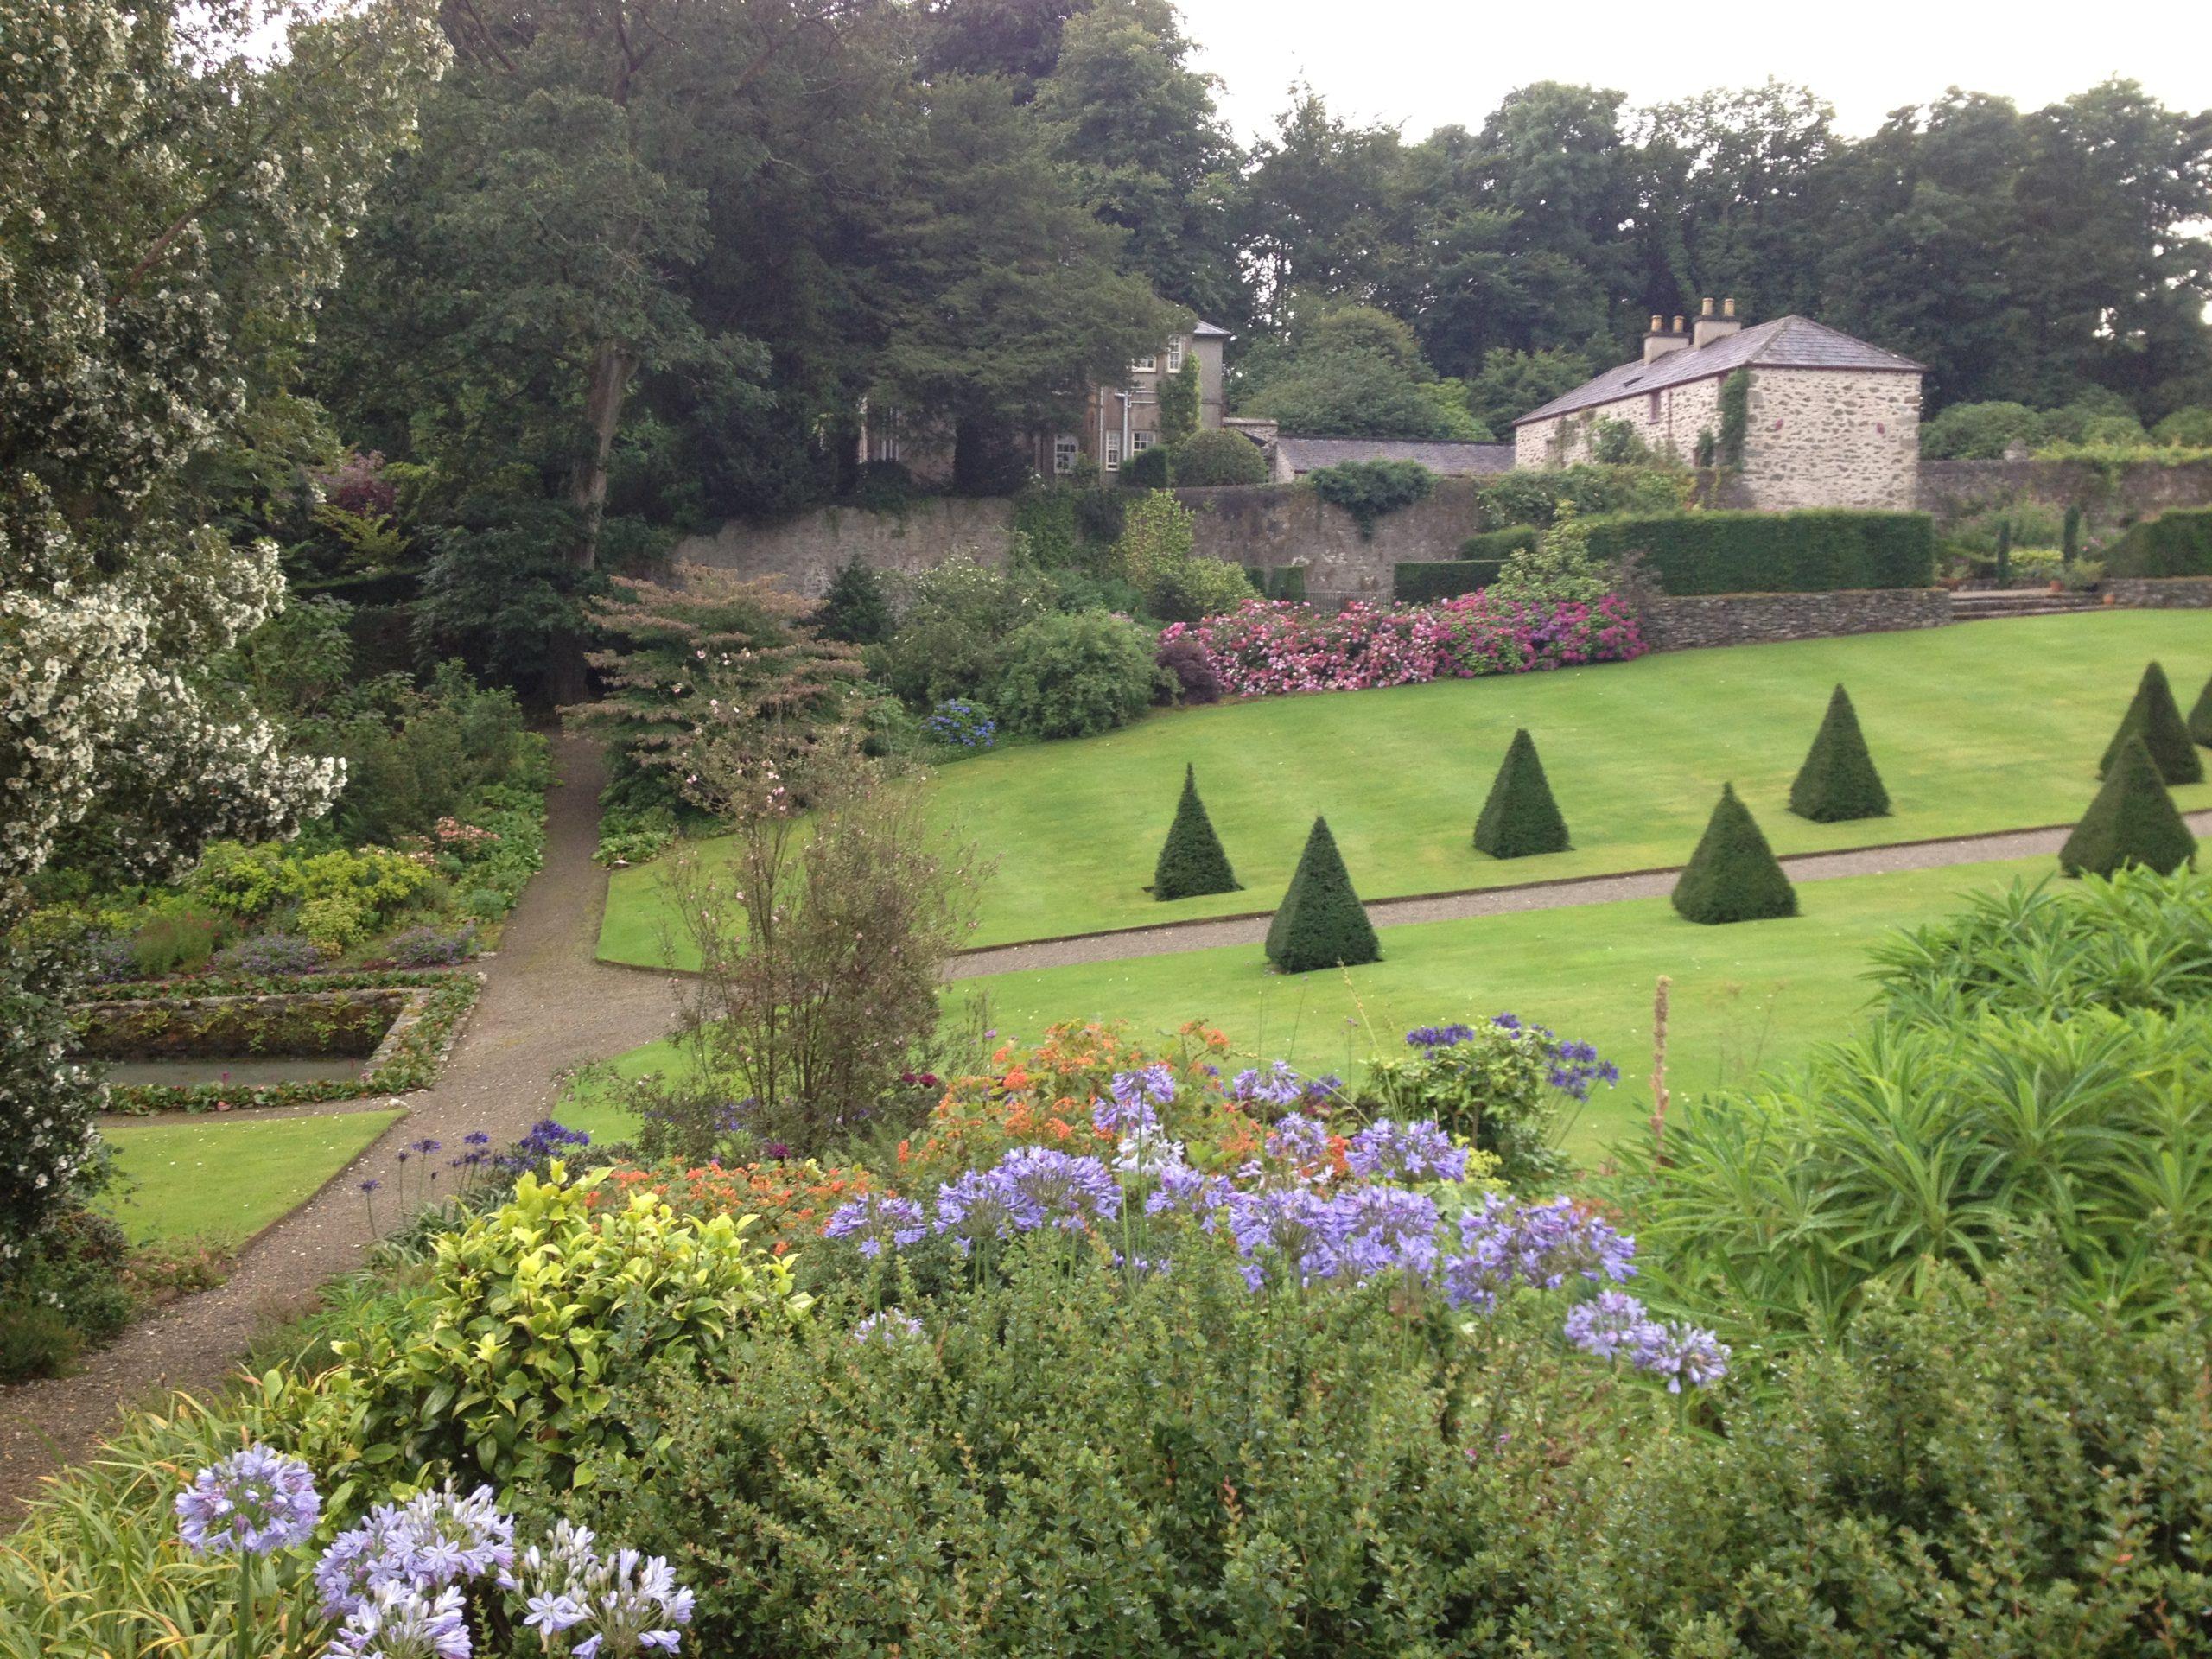 Part of the formal garden Plas Cadnant